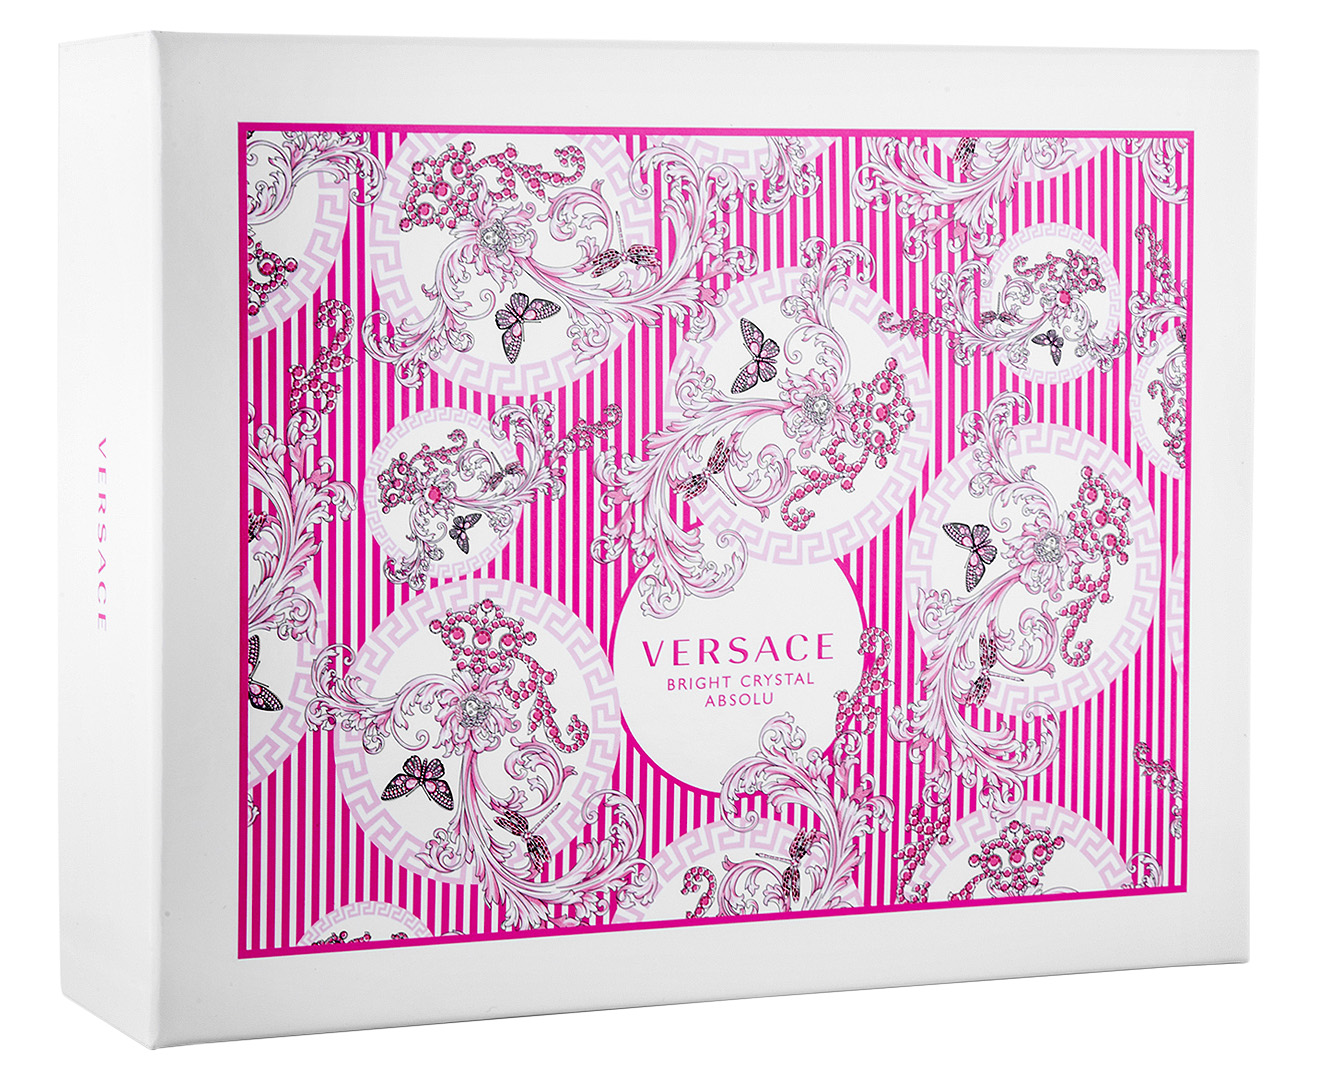 versace bright crystal absolu edp 3 piece gift set ebay. Black Bedroom Furniture Sets. Home Design Ideas